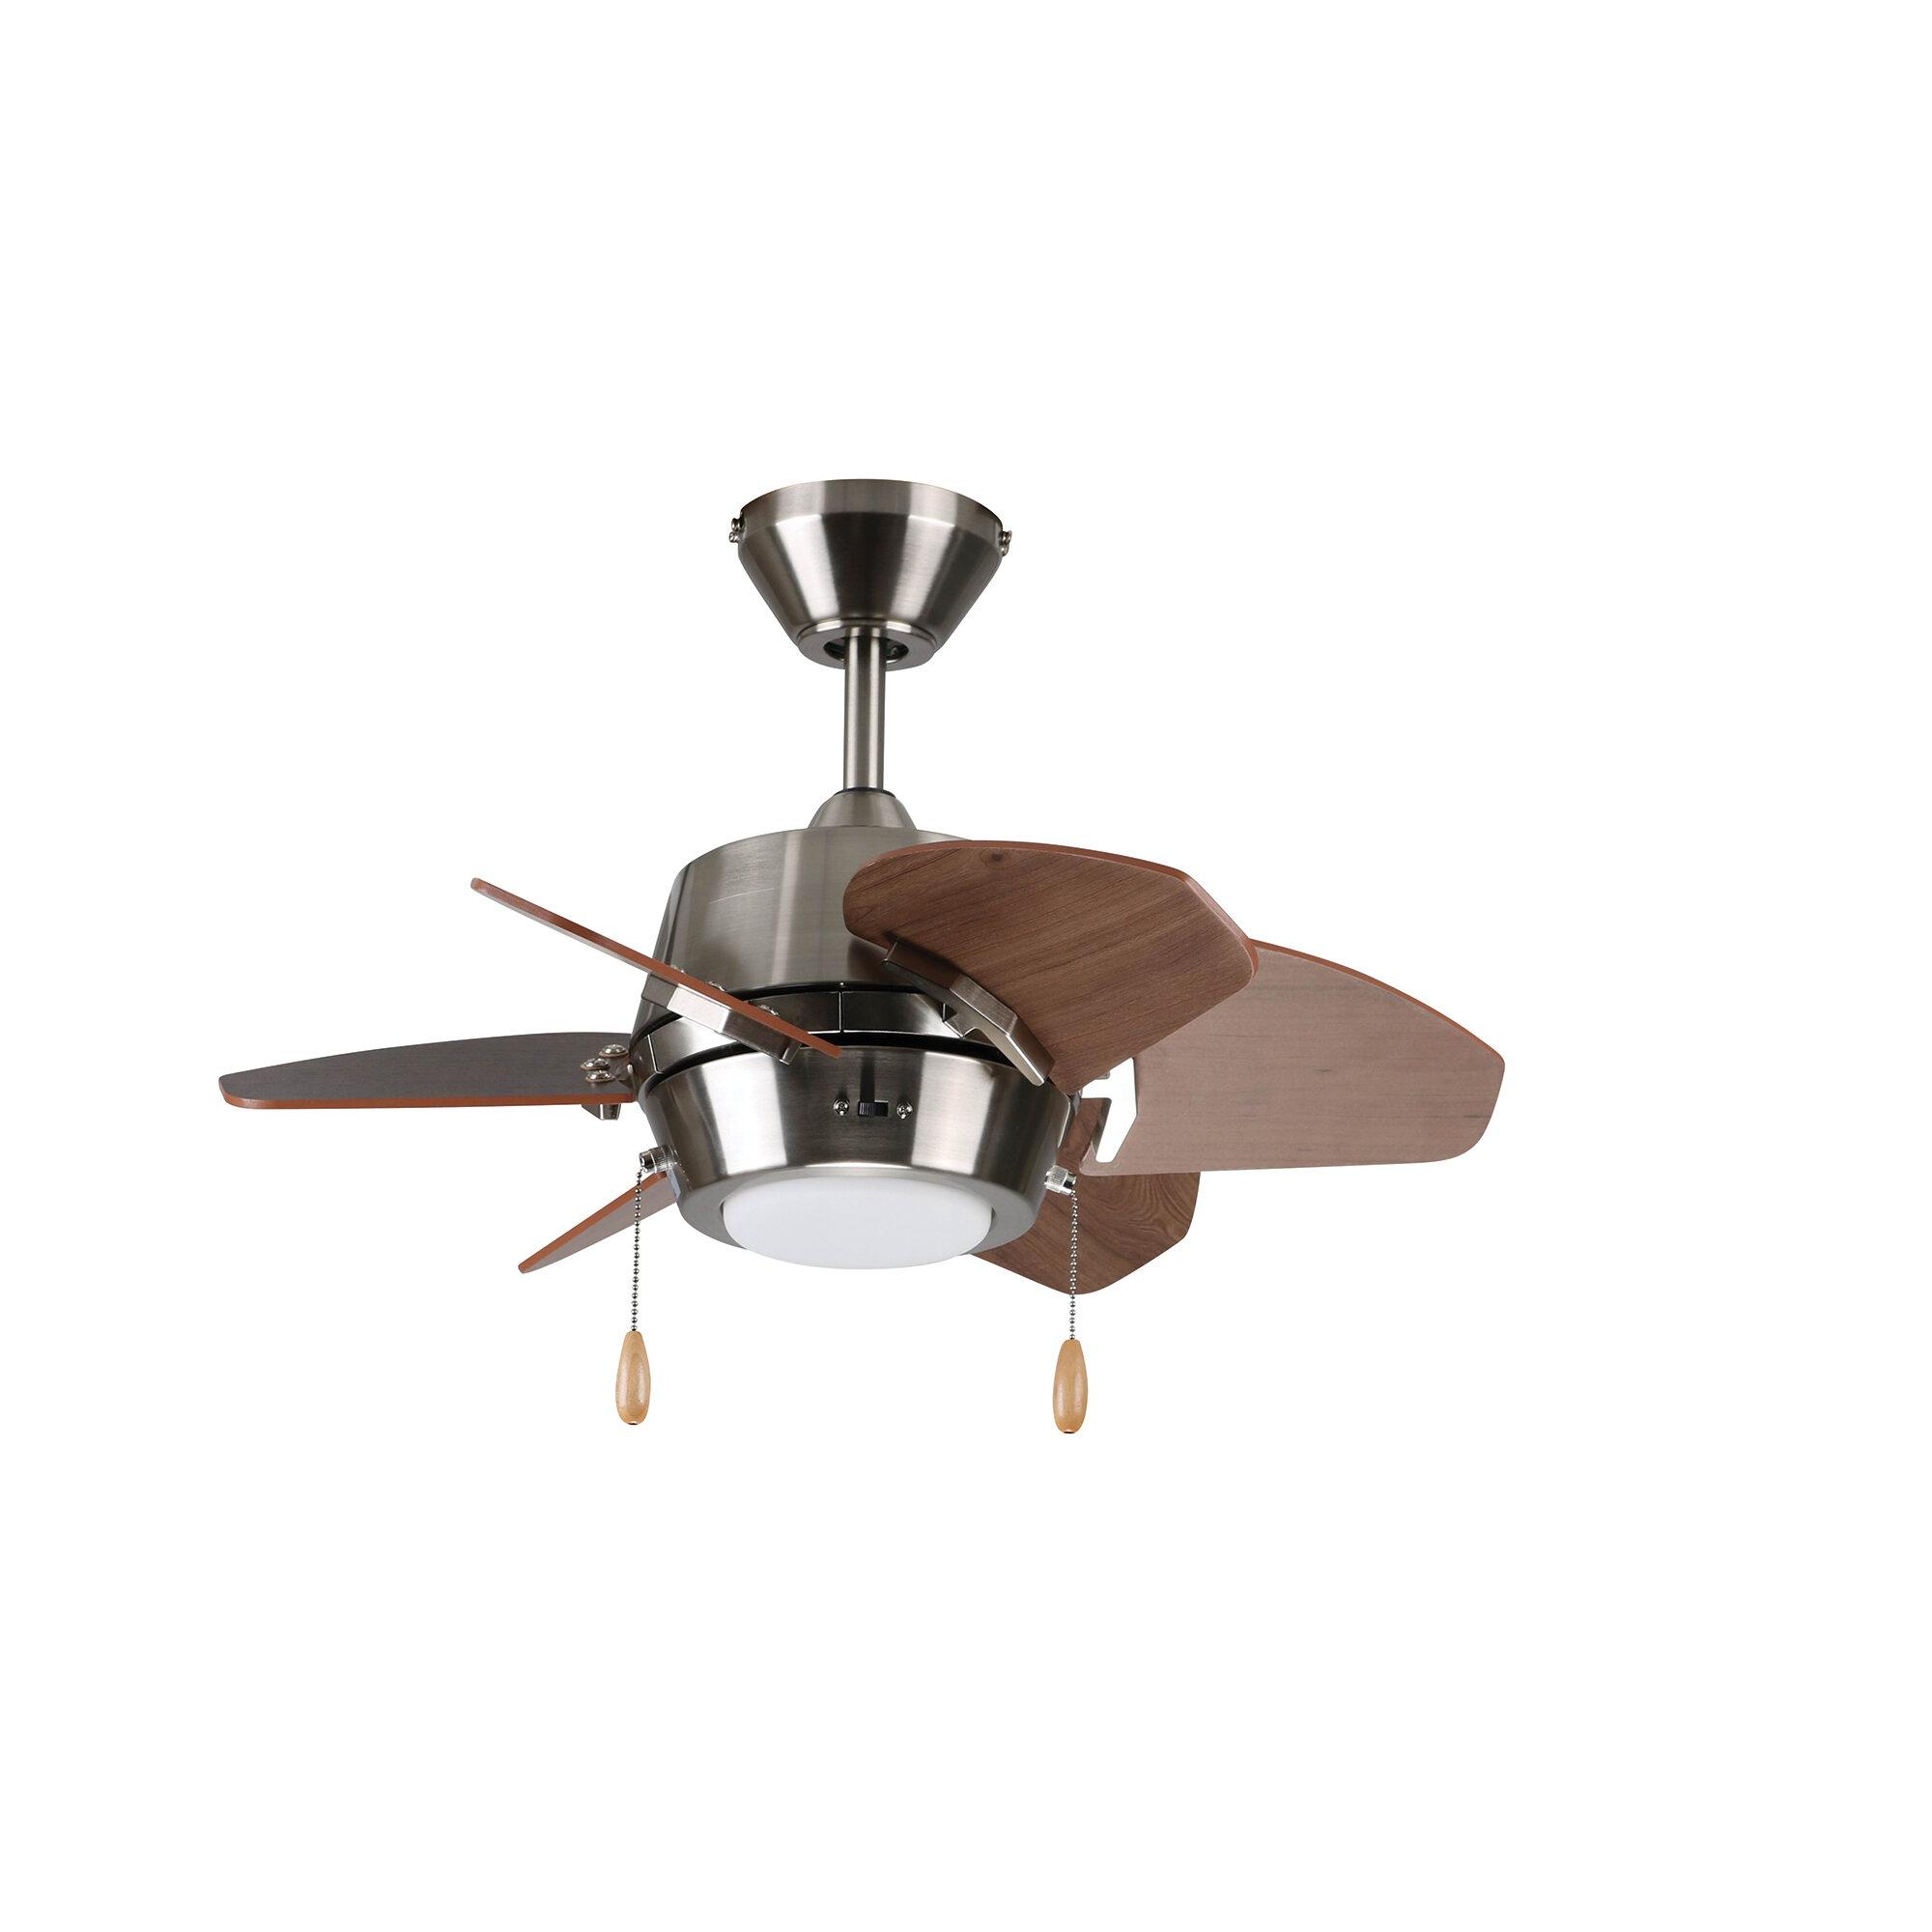 17 Stories 24 Lujan 6 Blade Propeller Ceiling Fan With Light Kit Included Reviews Wayfair